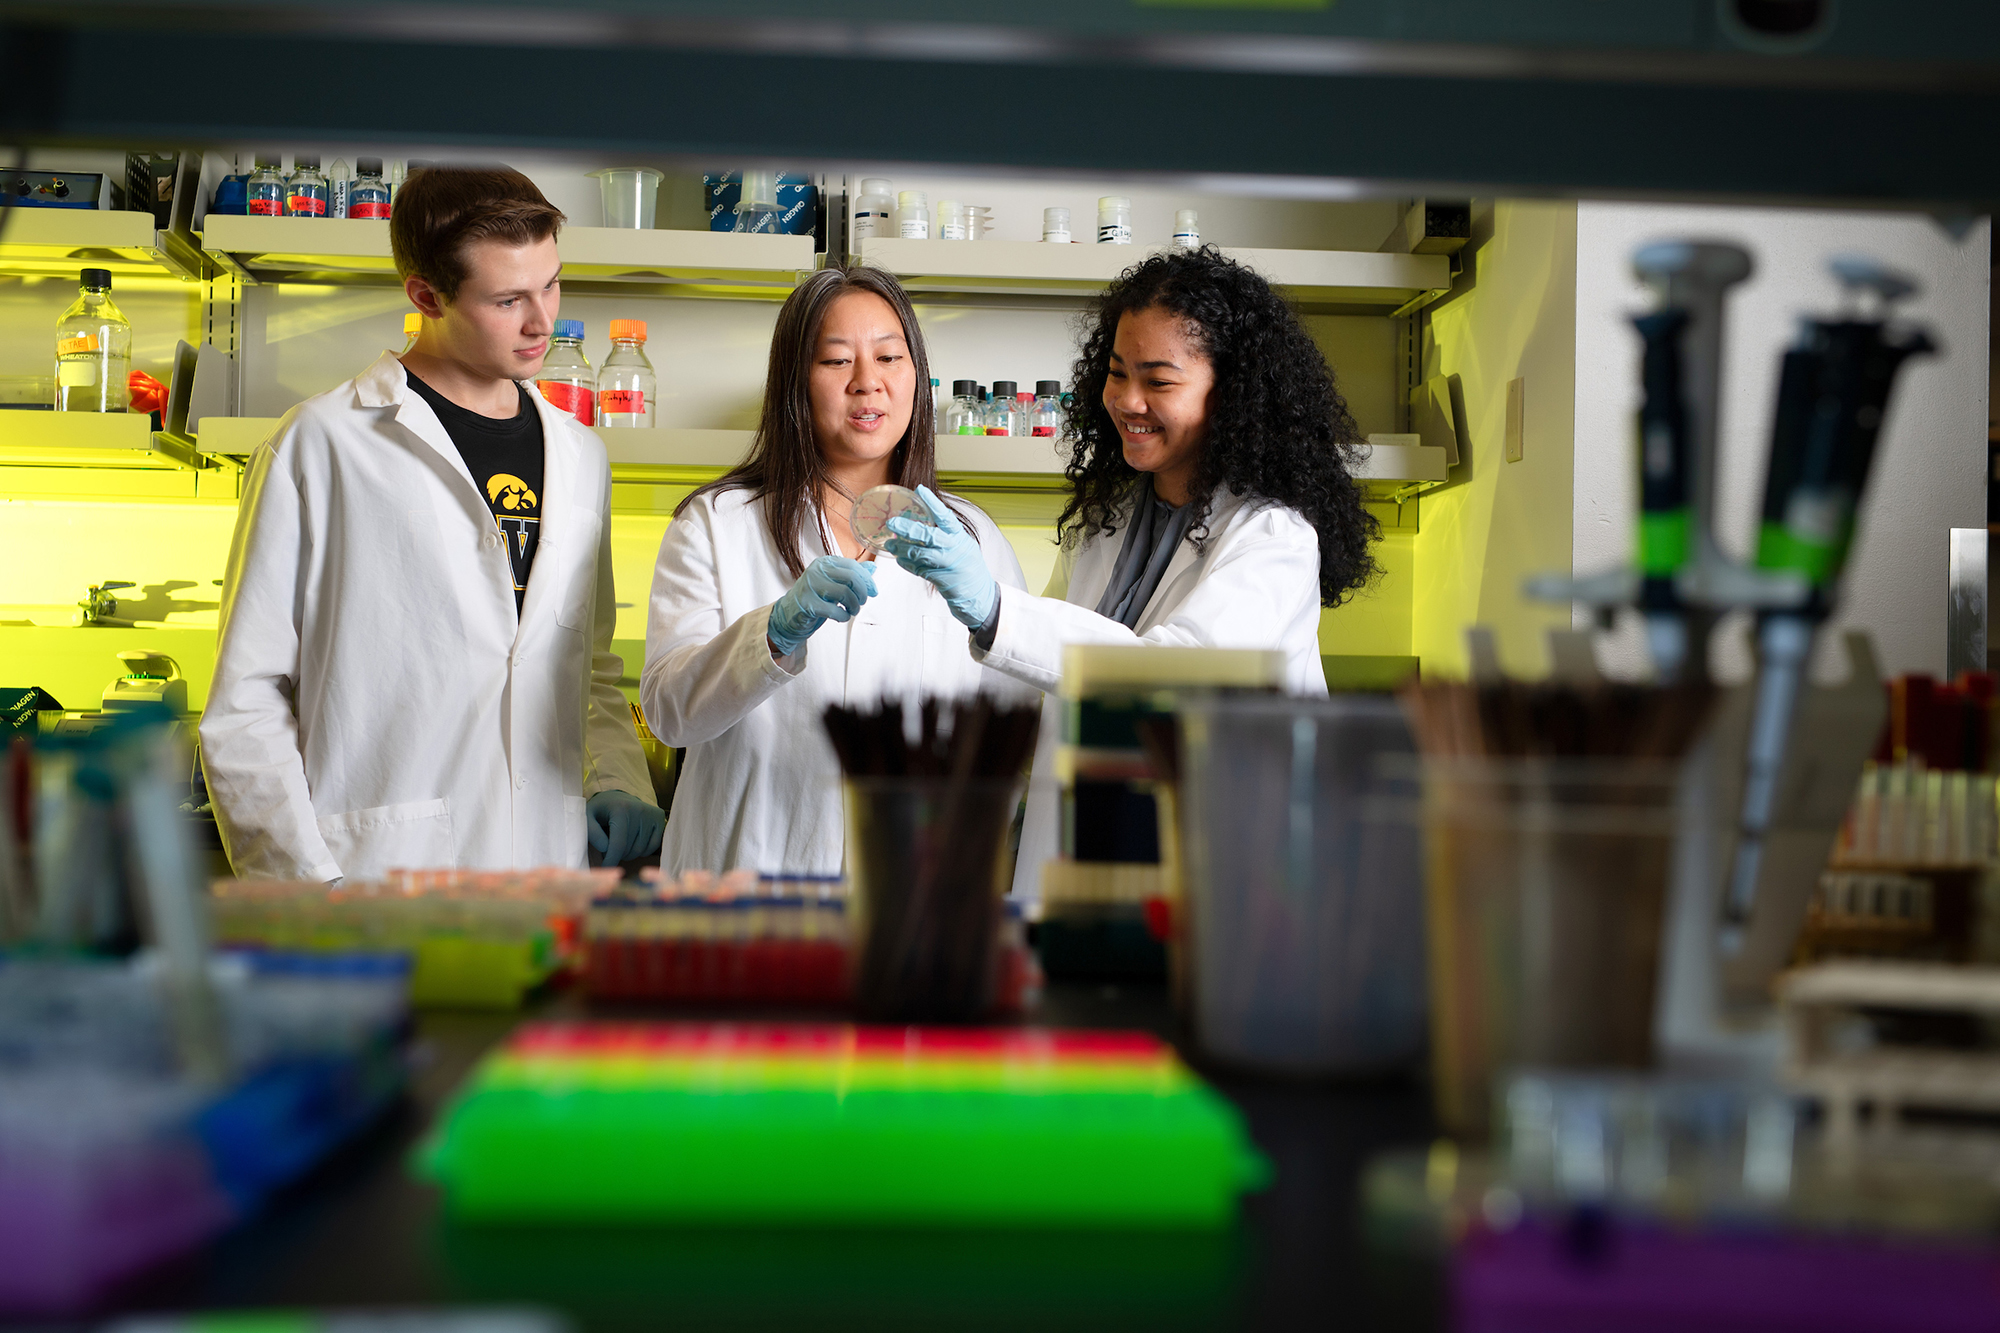 University of Iowa Carver College of Medicine microbiology lab